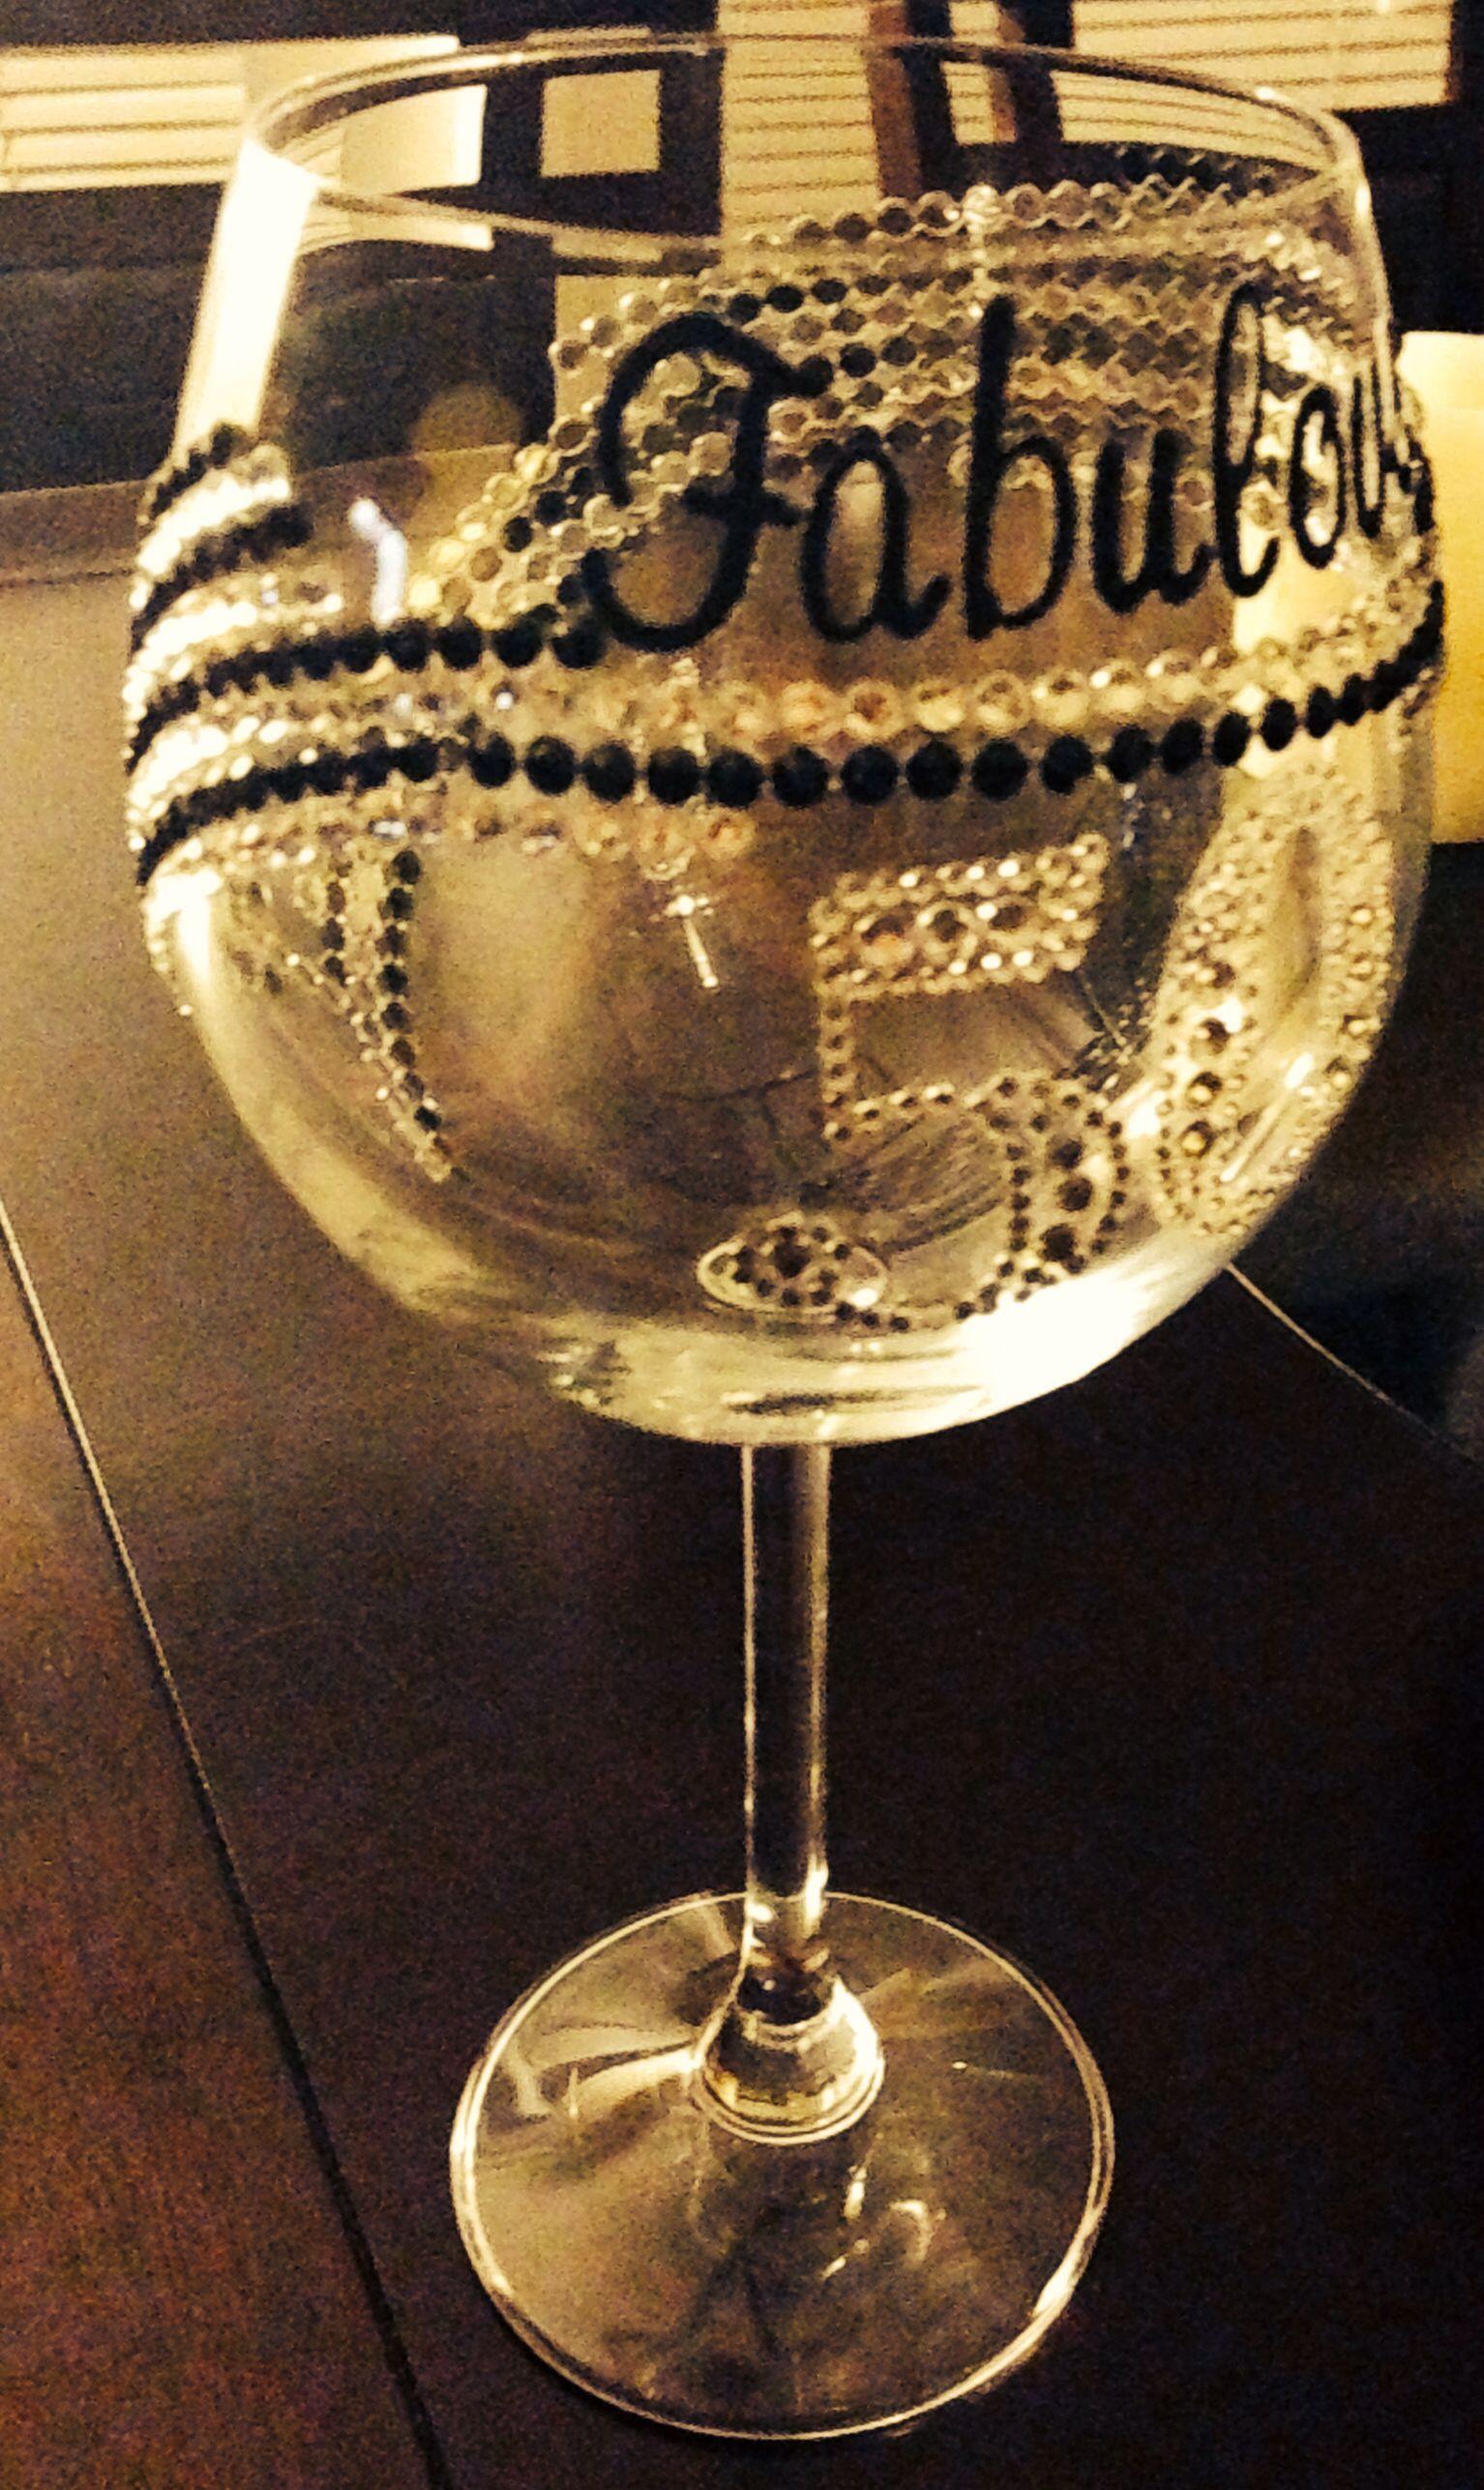 Fabulous Fifty DIY Wine Glass Custom Birthday Gift Moms 50th Party